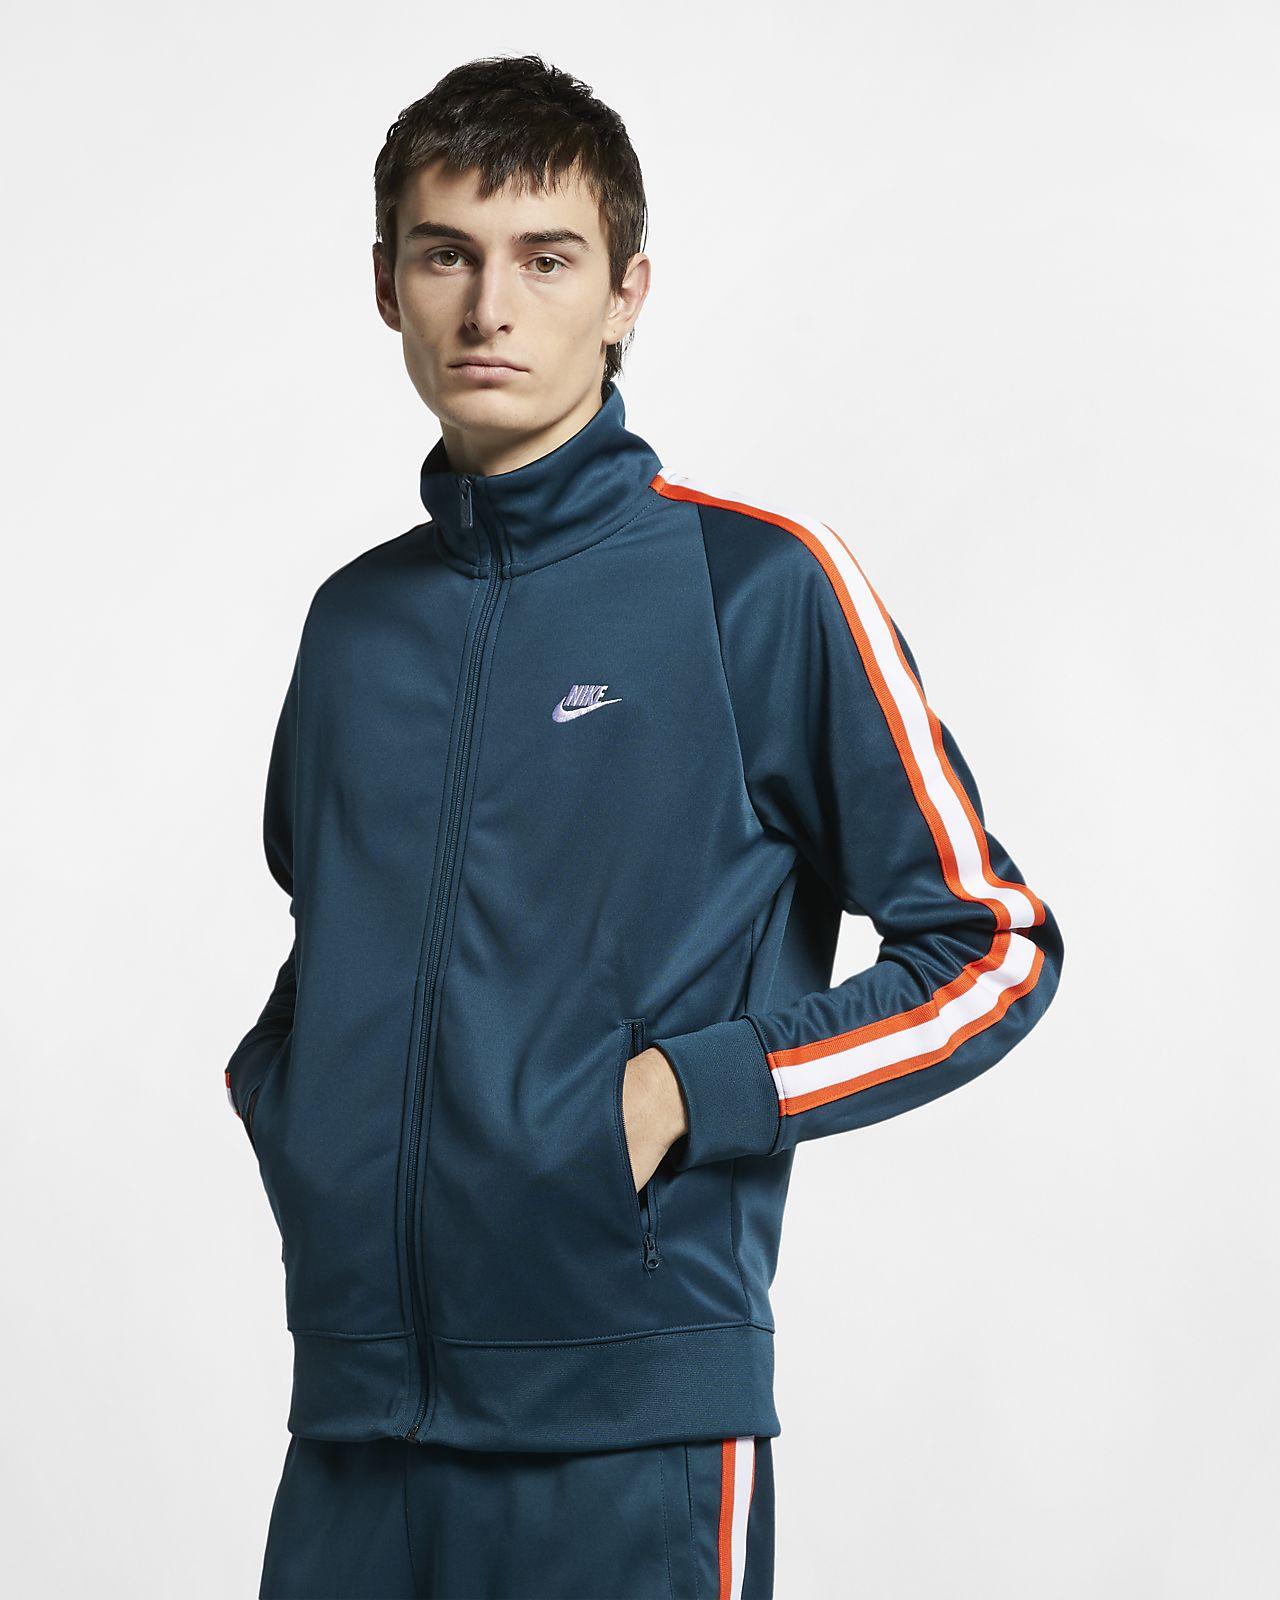 bdc4ede20 Nike Sportswear N98 Men's Knit Warm-Up Jacket. Nike.com SI